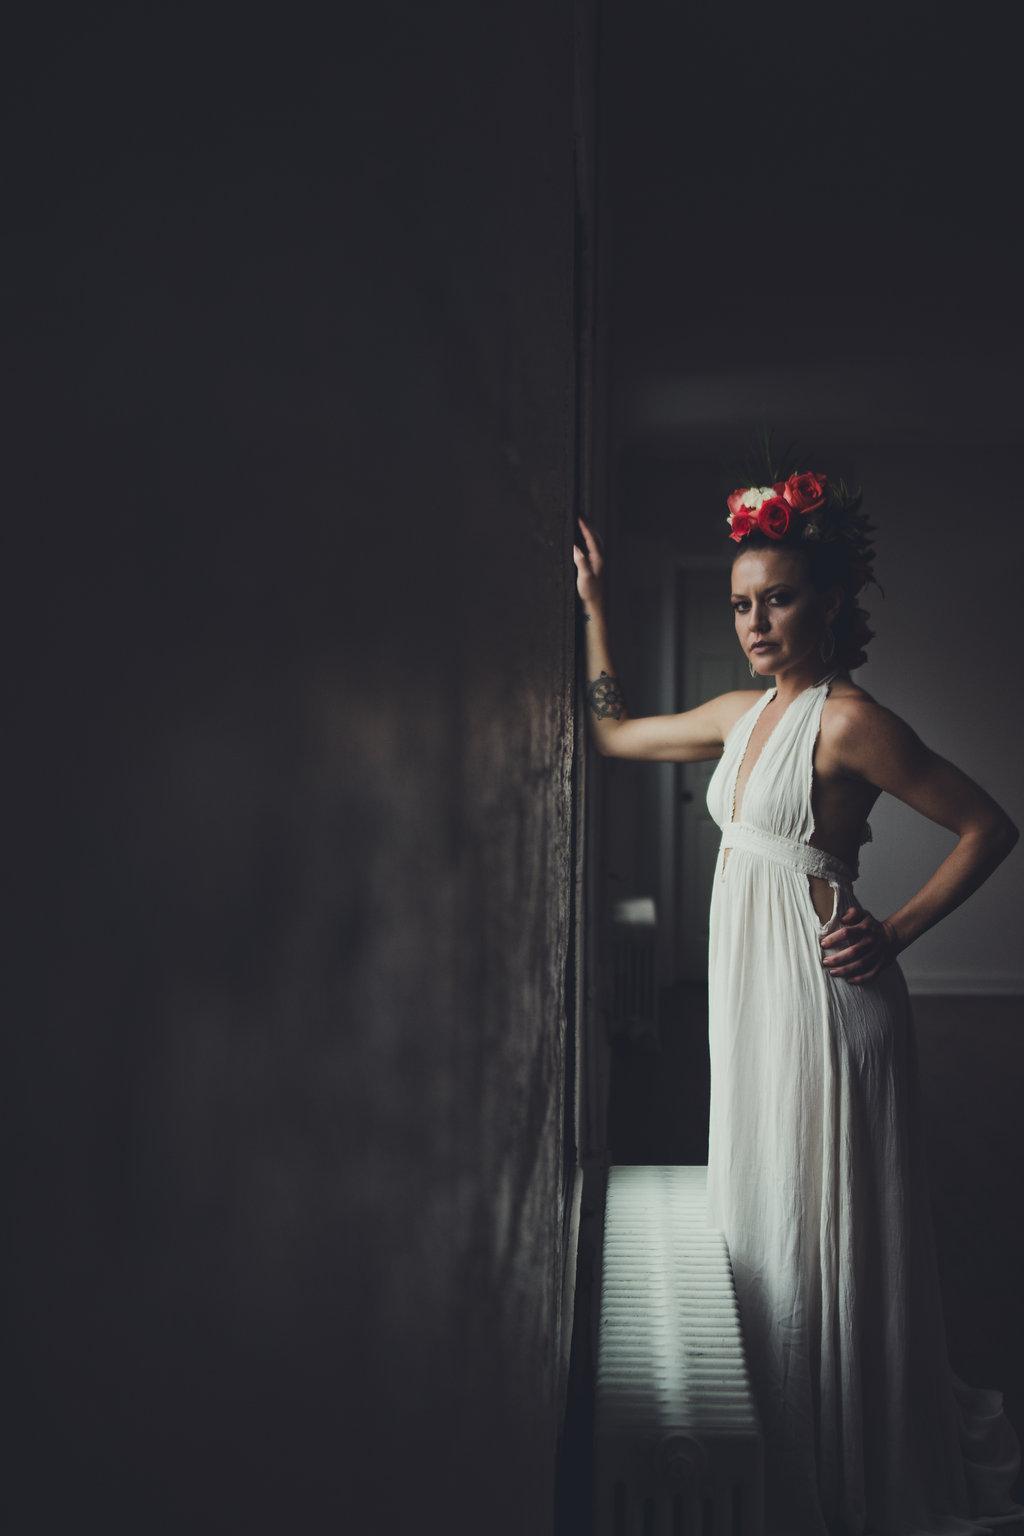 Lisa Rundall Wedding Photography Colorado model with hand on wall